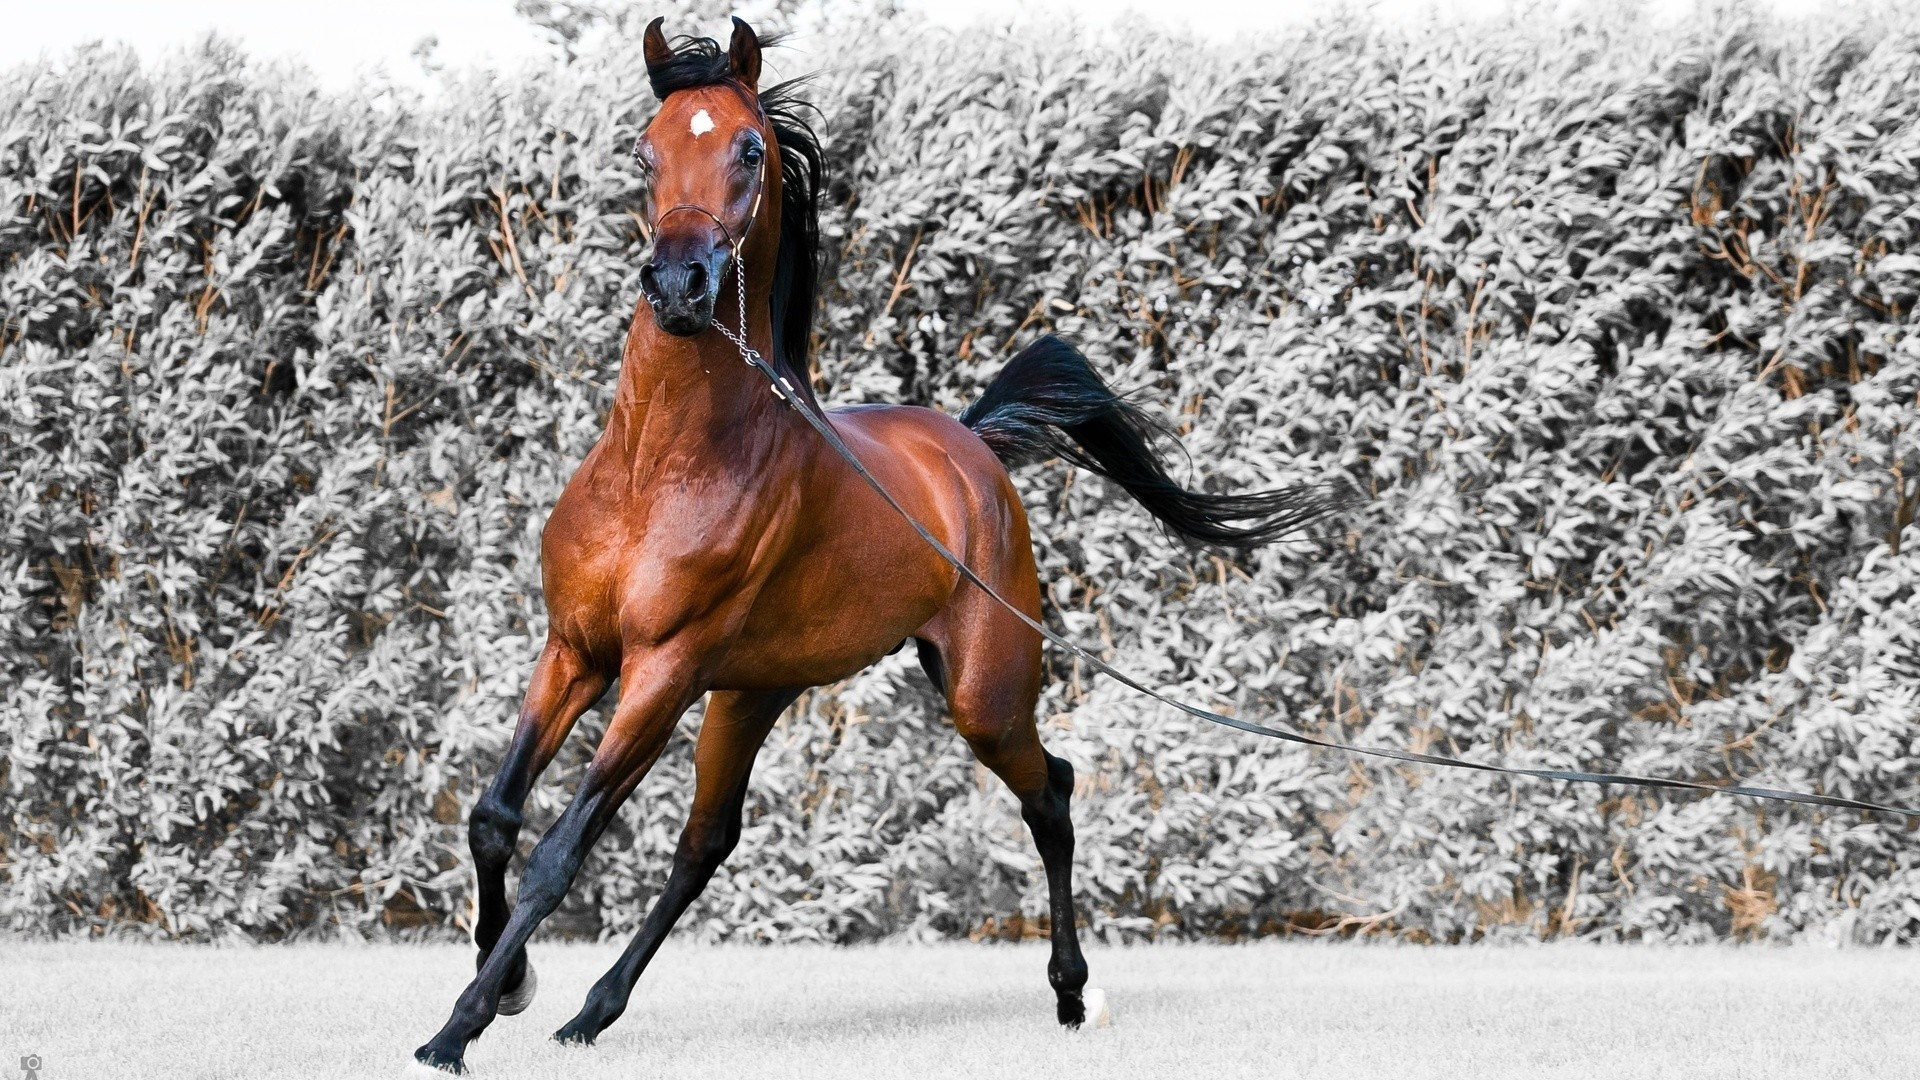 Arabian Horse Wallpapers Hd 1920x1080 Download Hd Wallpaper Wallpapertip